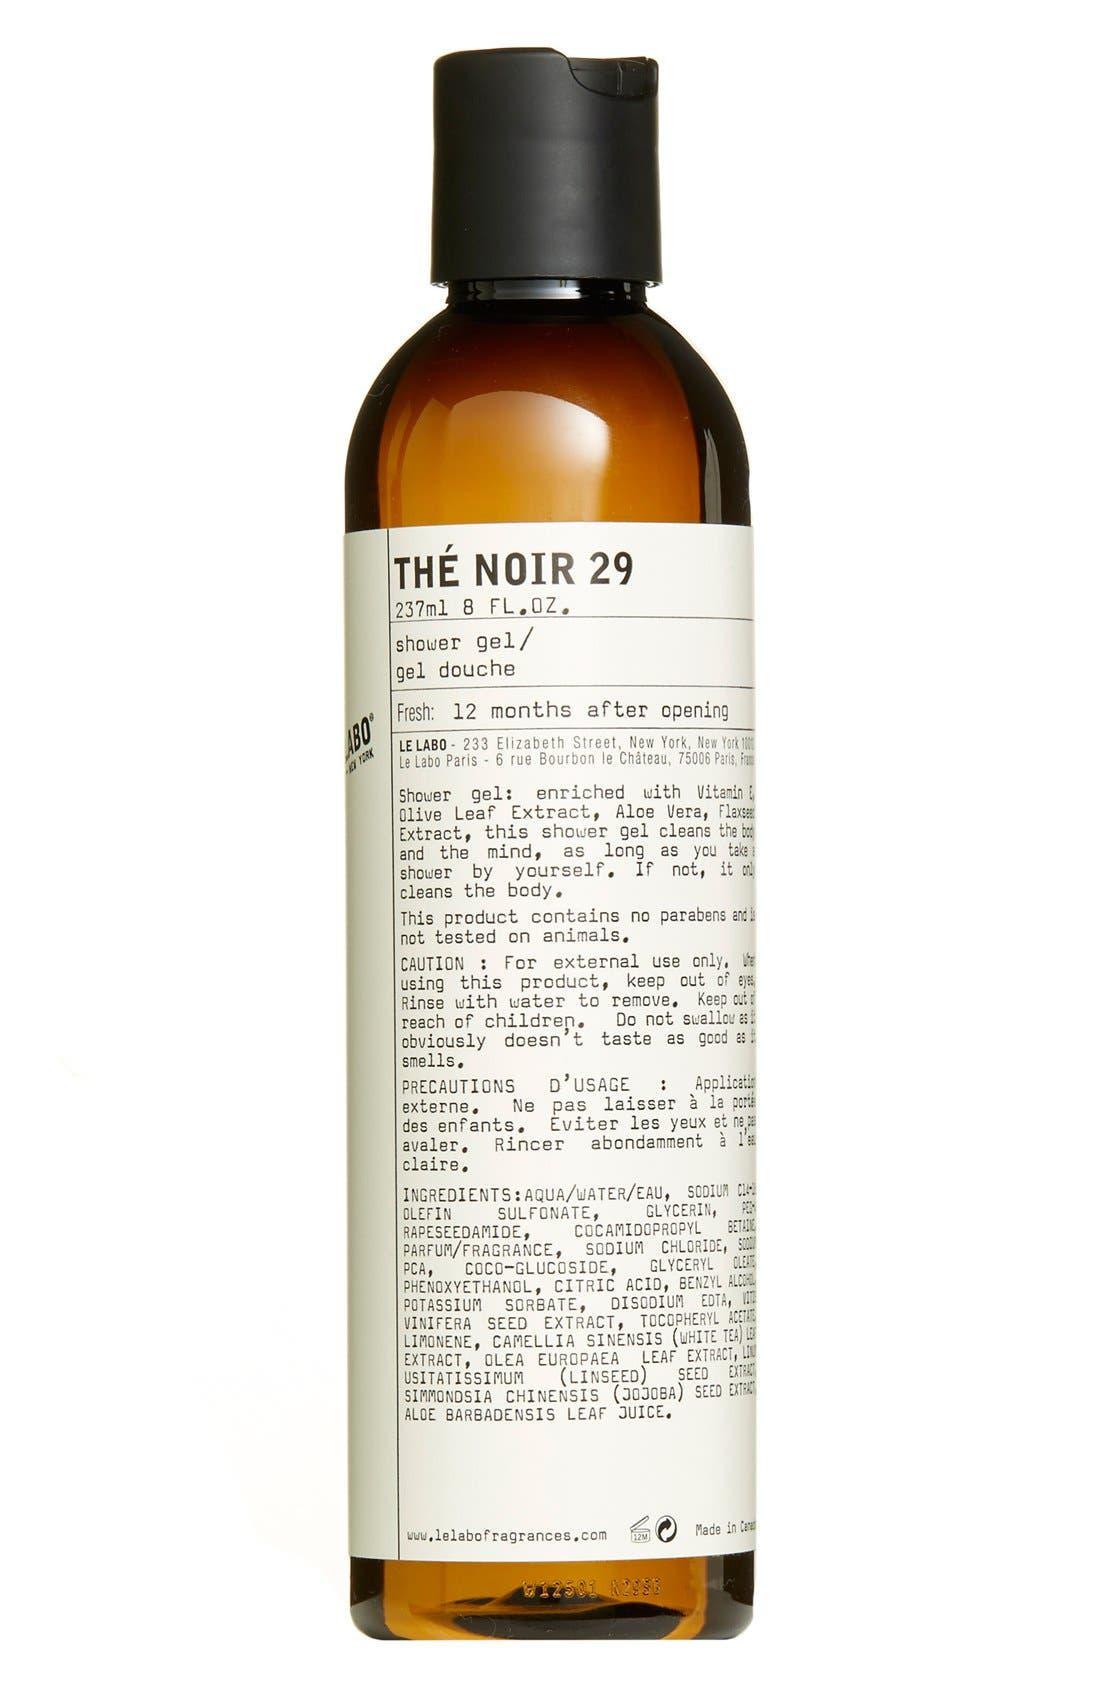 The Noir 29 Shower Gel